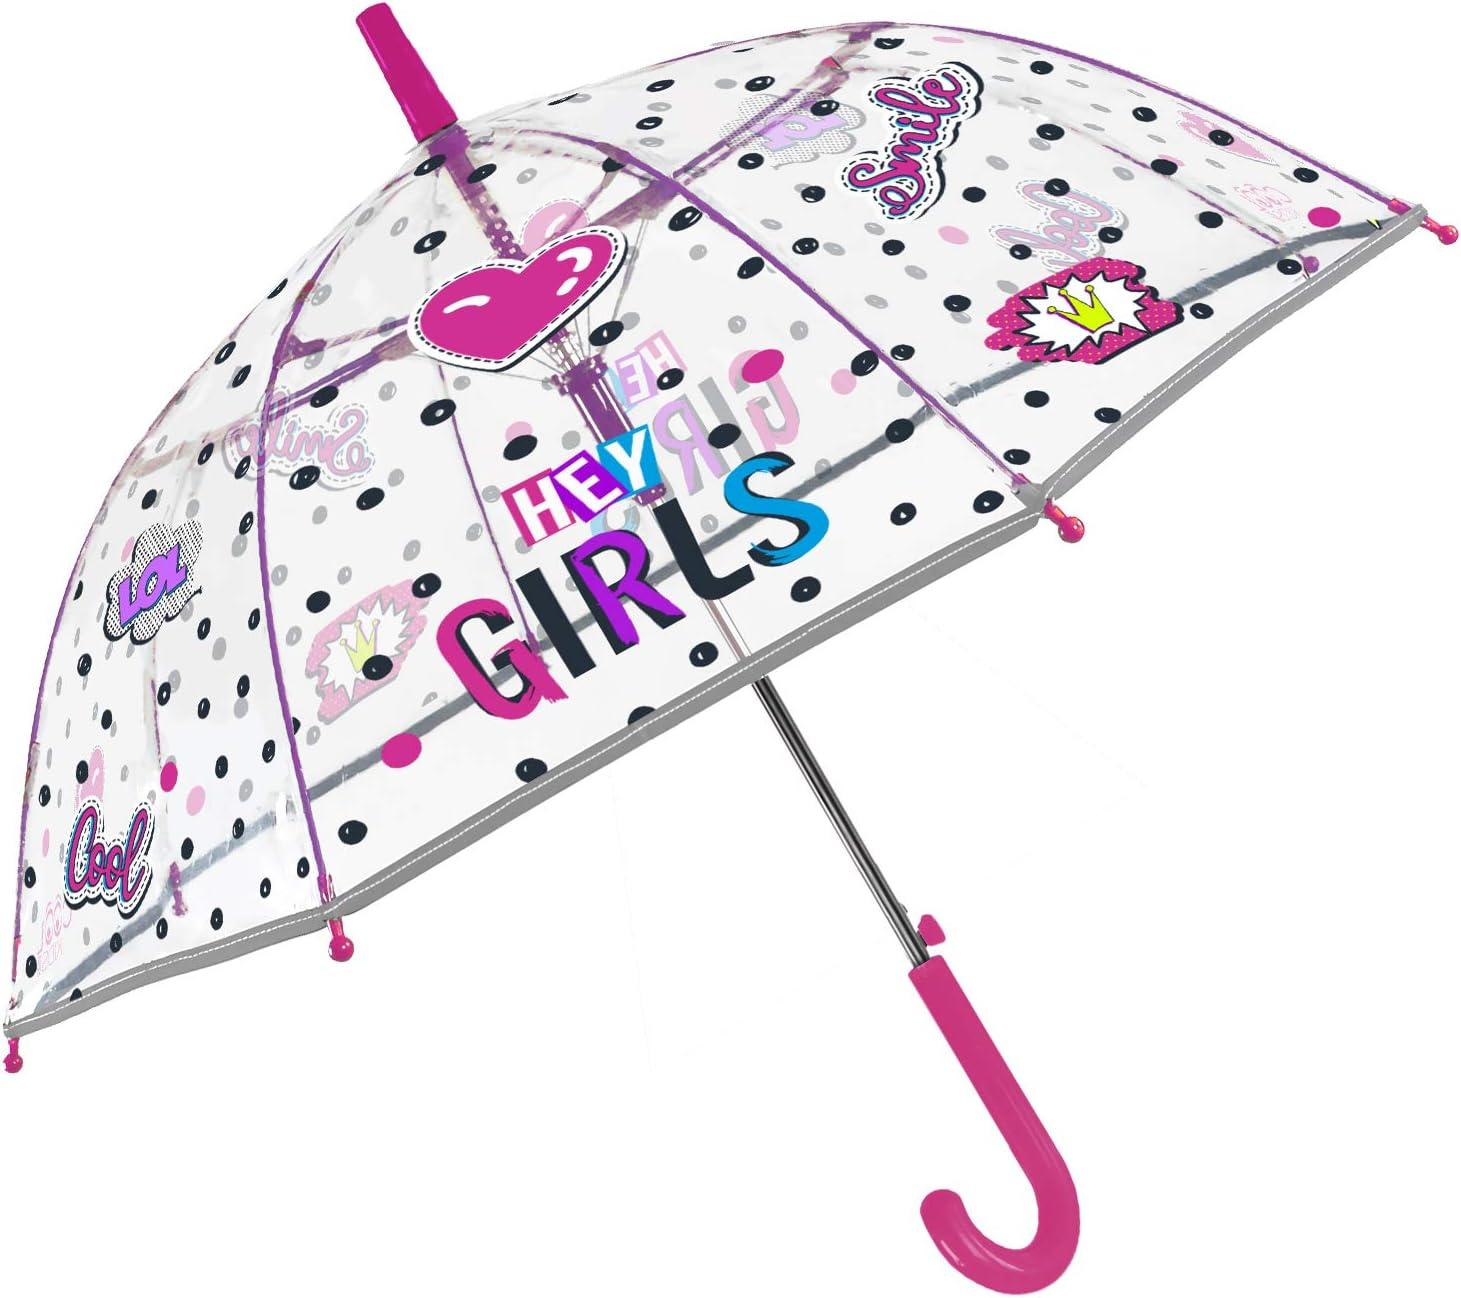 Star Wars PERLETTI Stockschirm Kinder Regenschirm